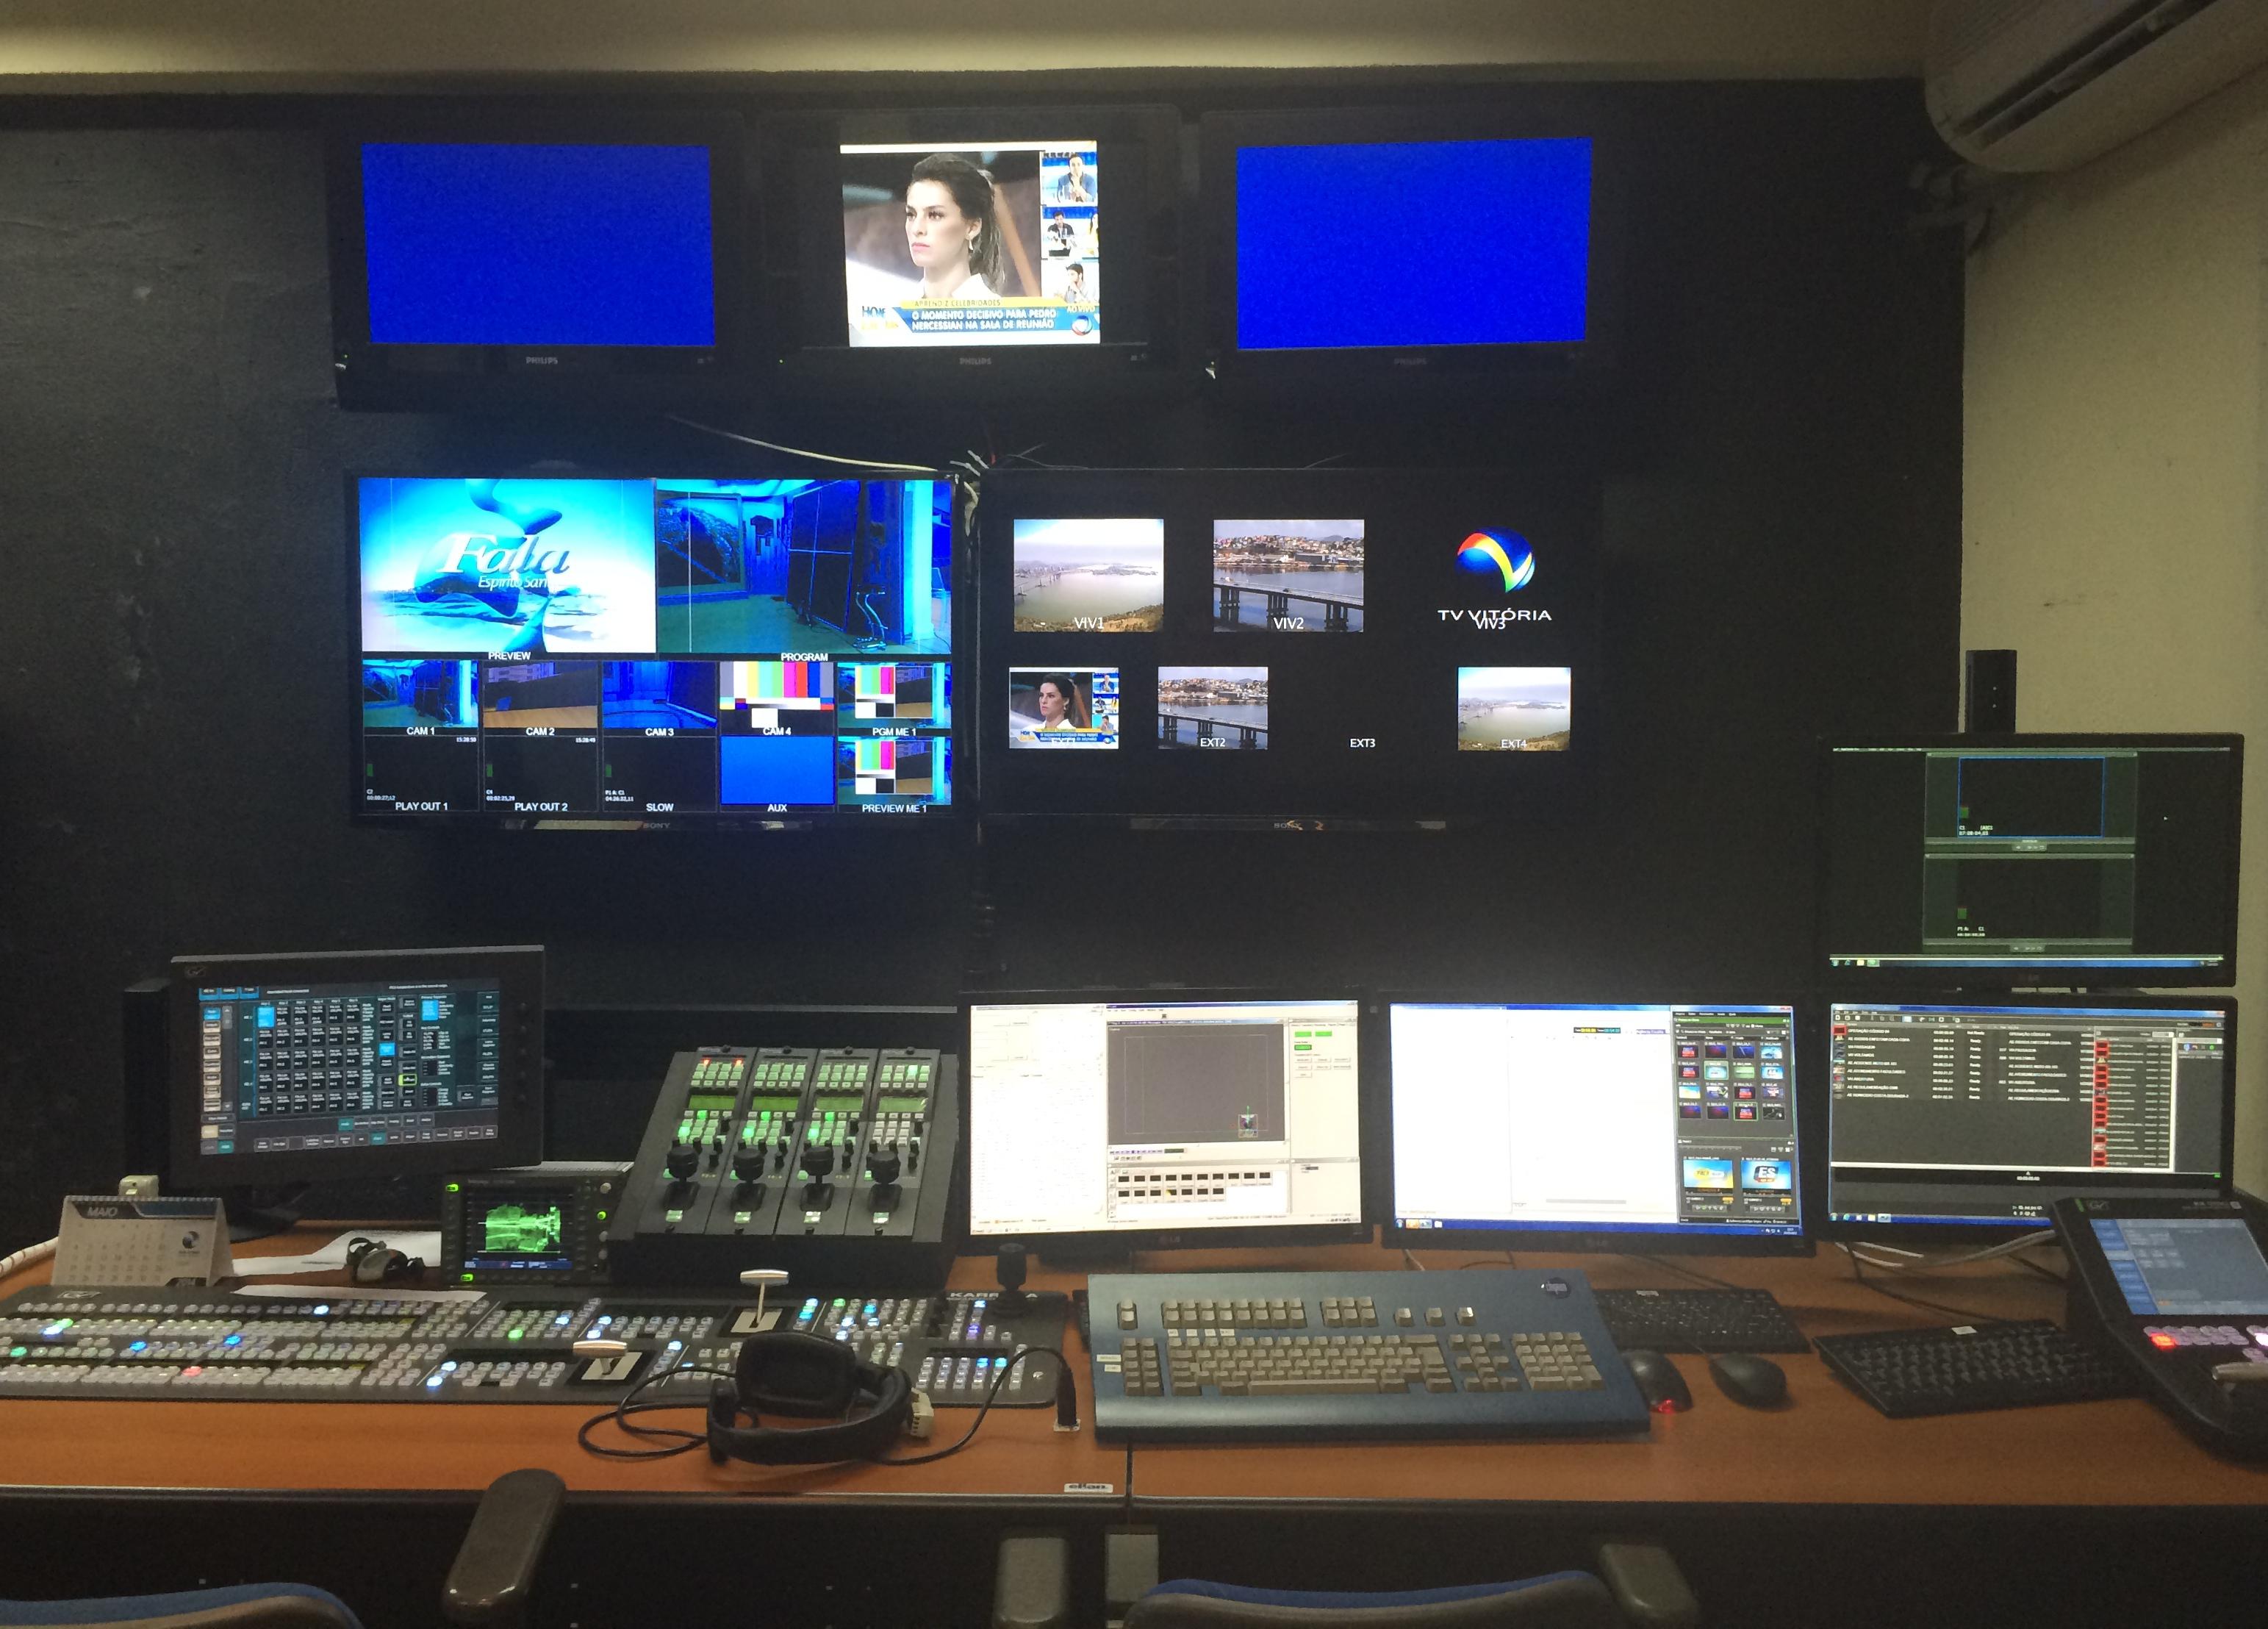 Faltam 3 Dias Sistema Full Hd Facilita Intera O Entre  -> Sala De Redacao Na Tv Ao Vivo